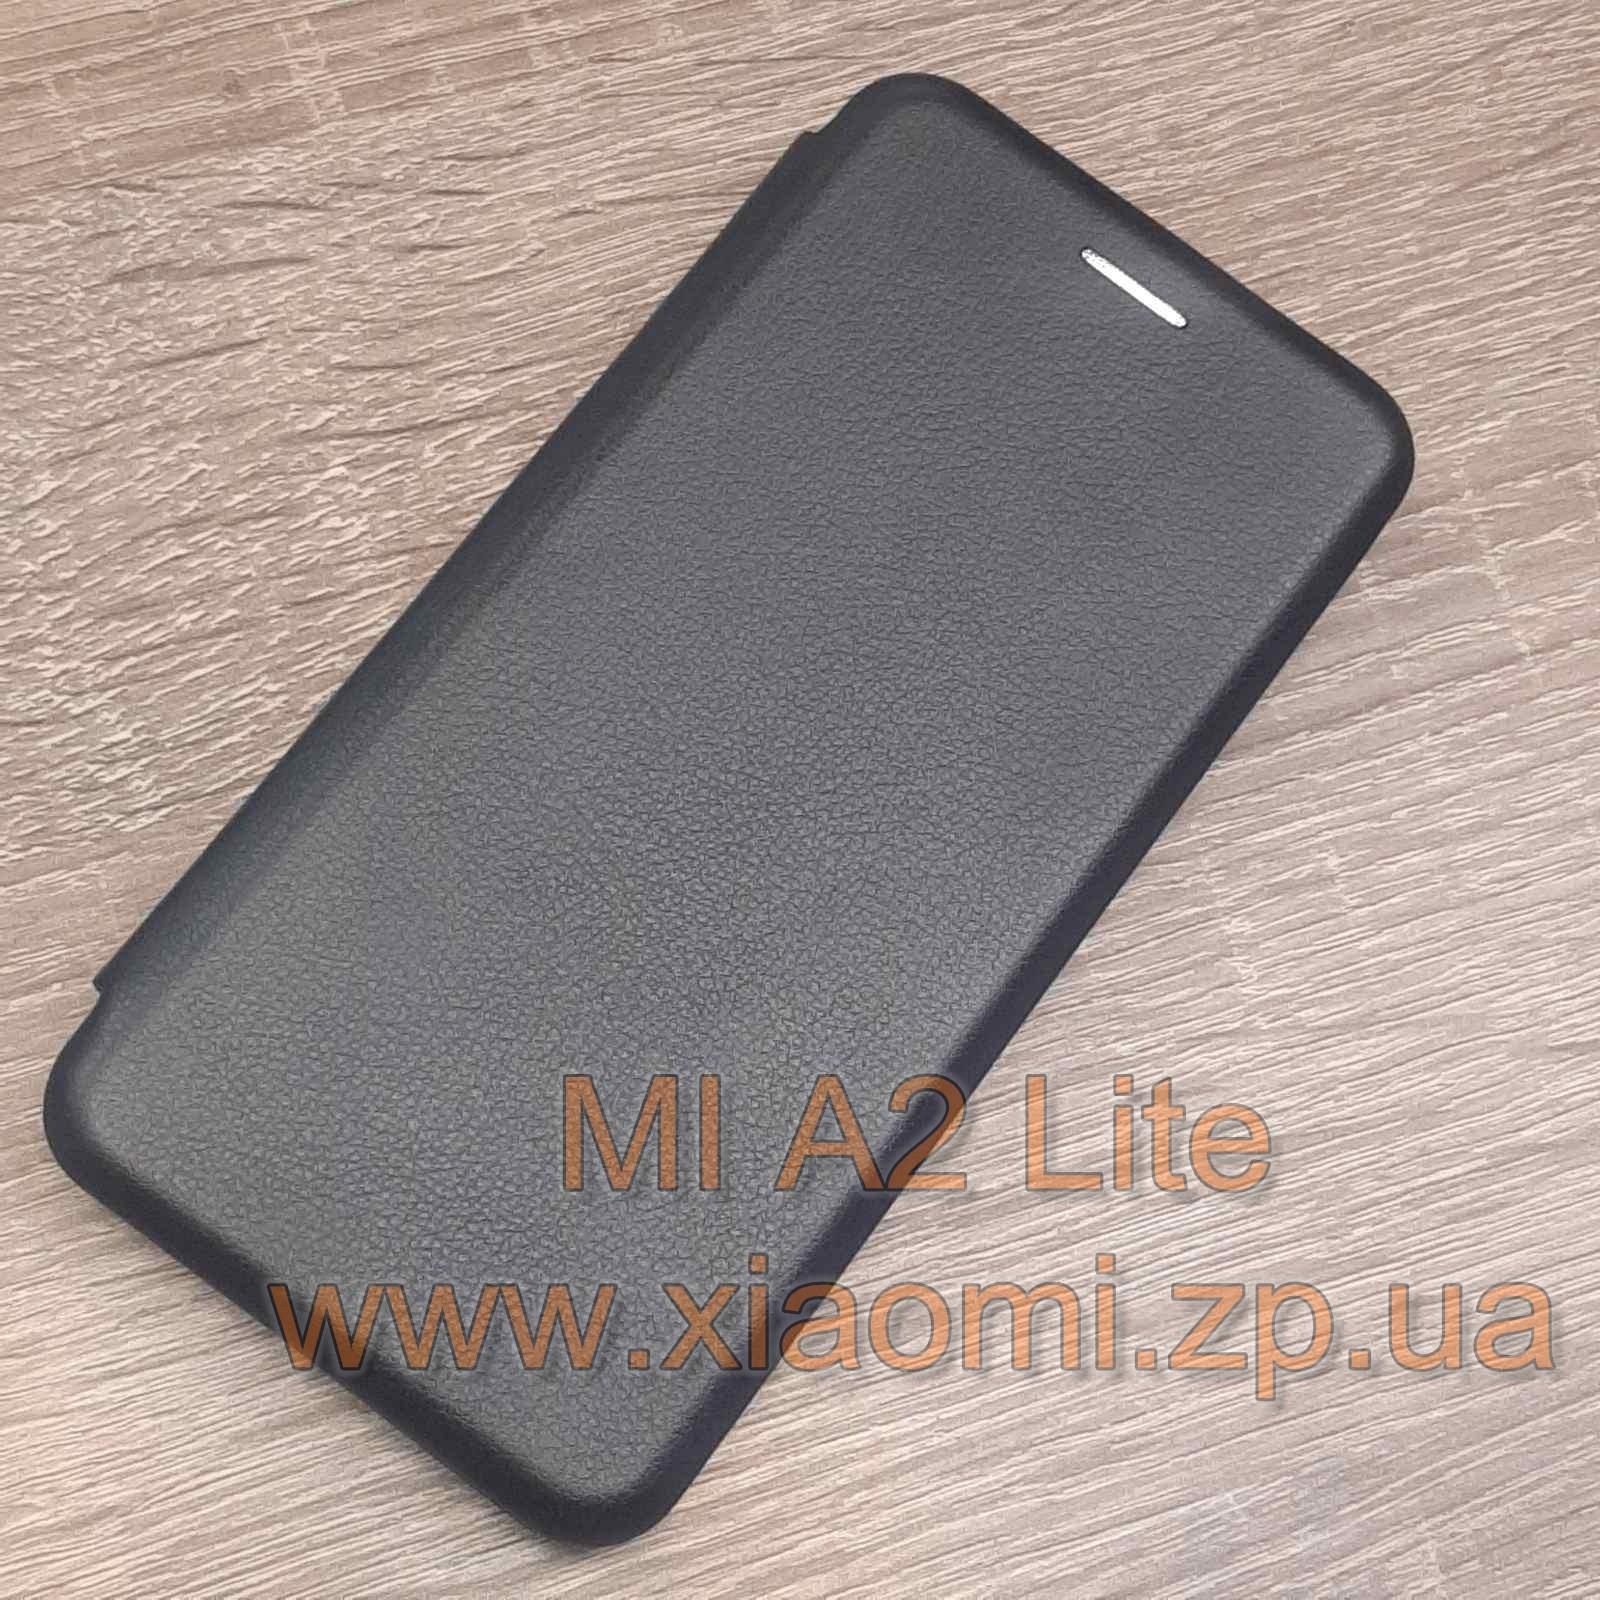 Чехол-книжка для Xiaomi MI A2 Lite